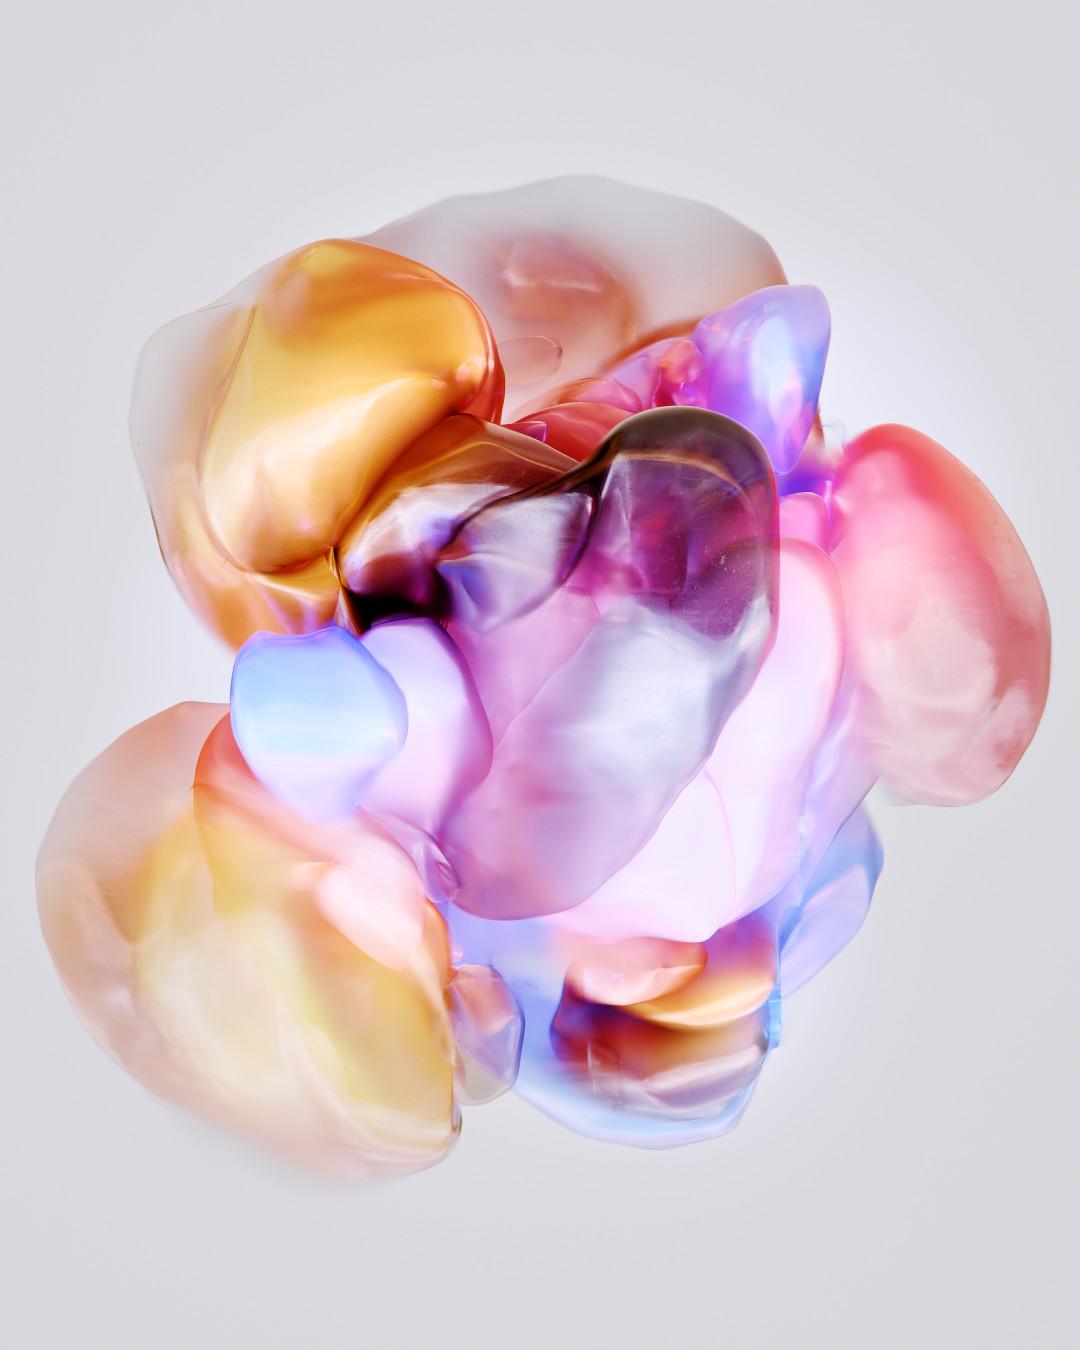 Colorclouds_09_cam1_0001